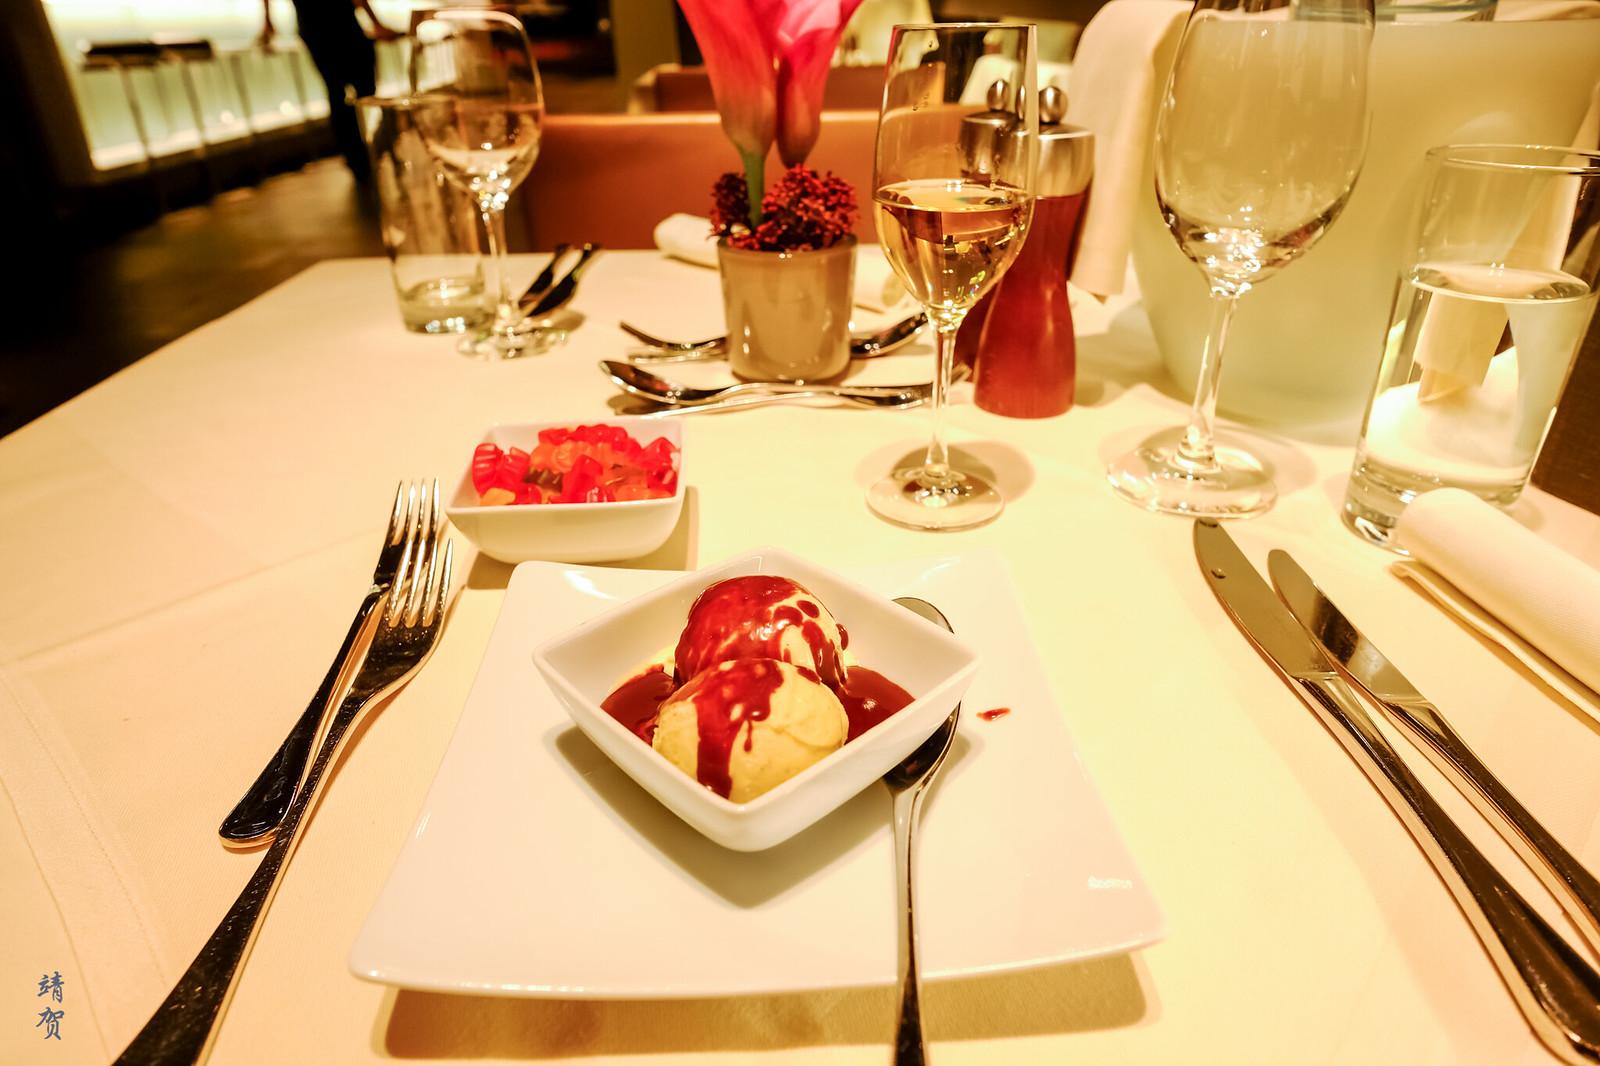 Vanilla sundae